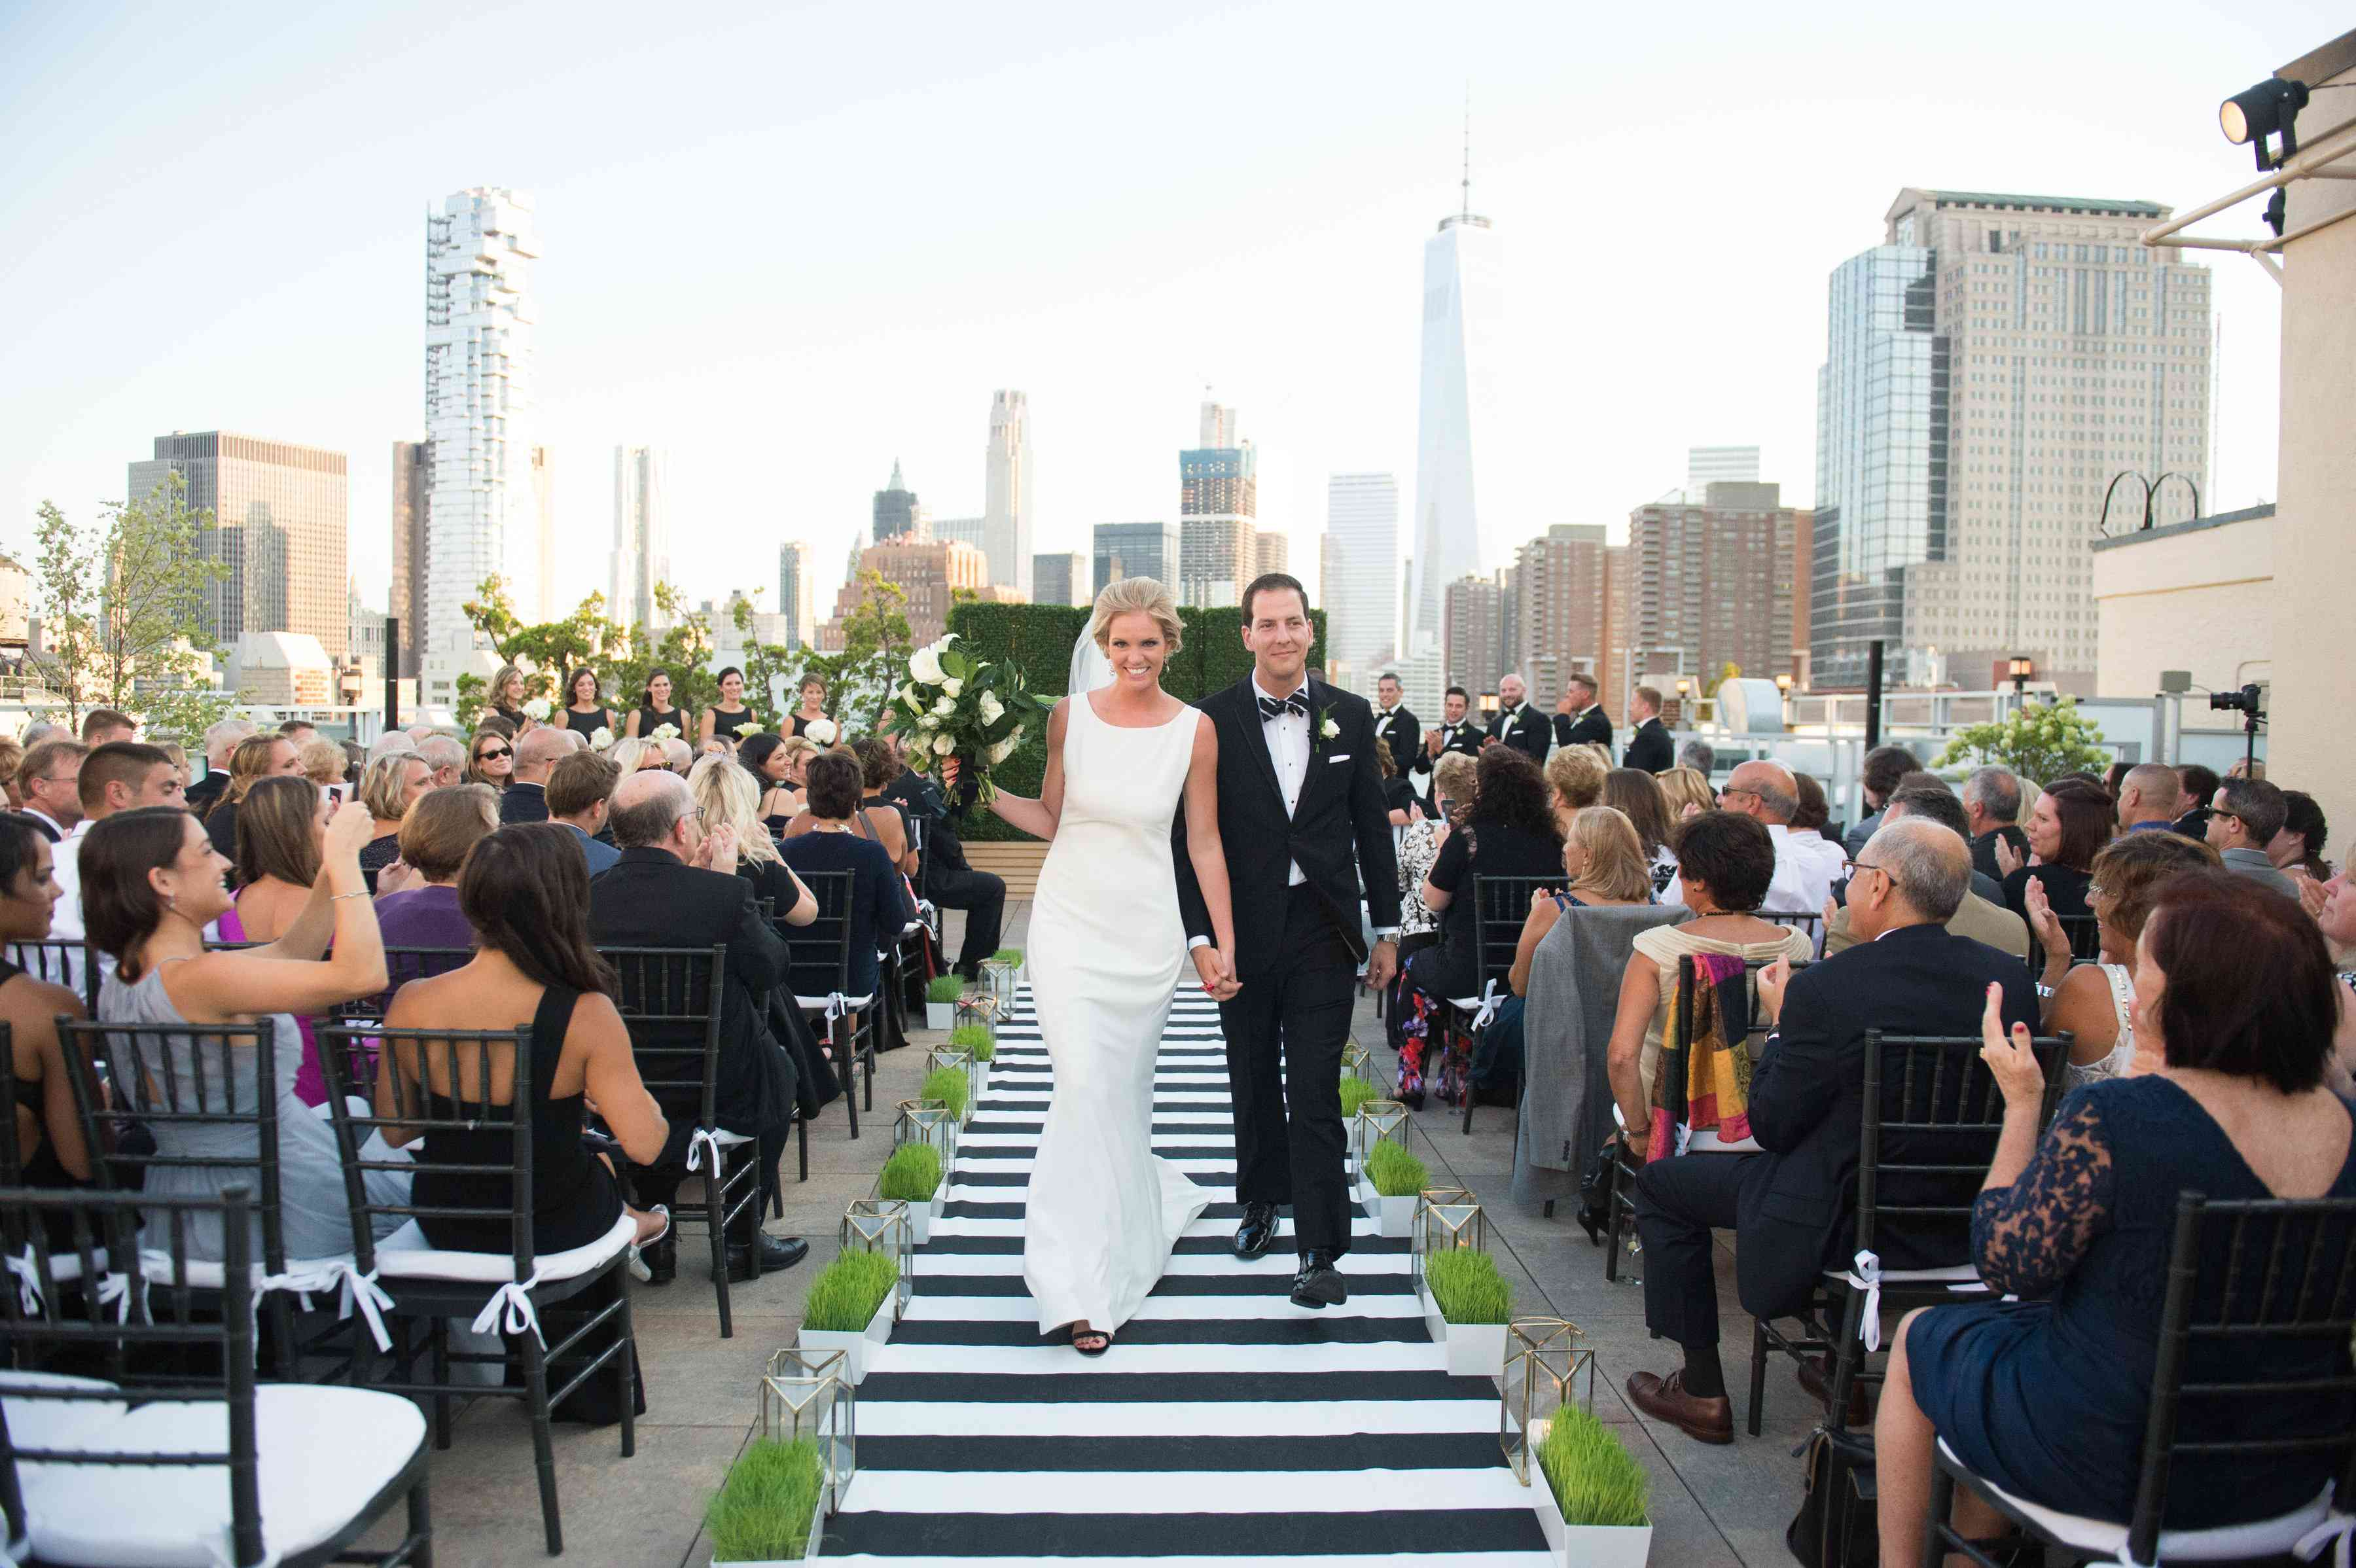 Bride and groom leaving aisle